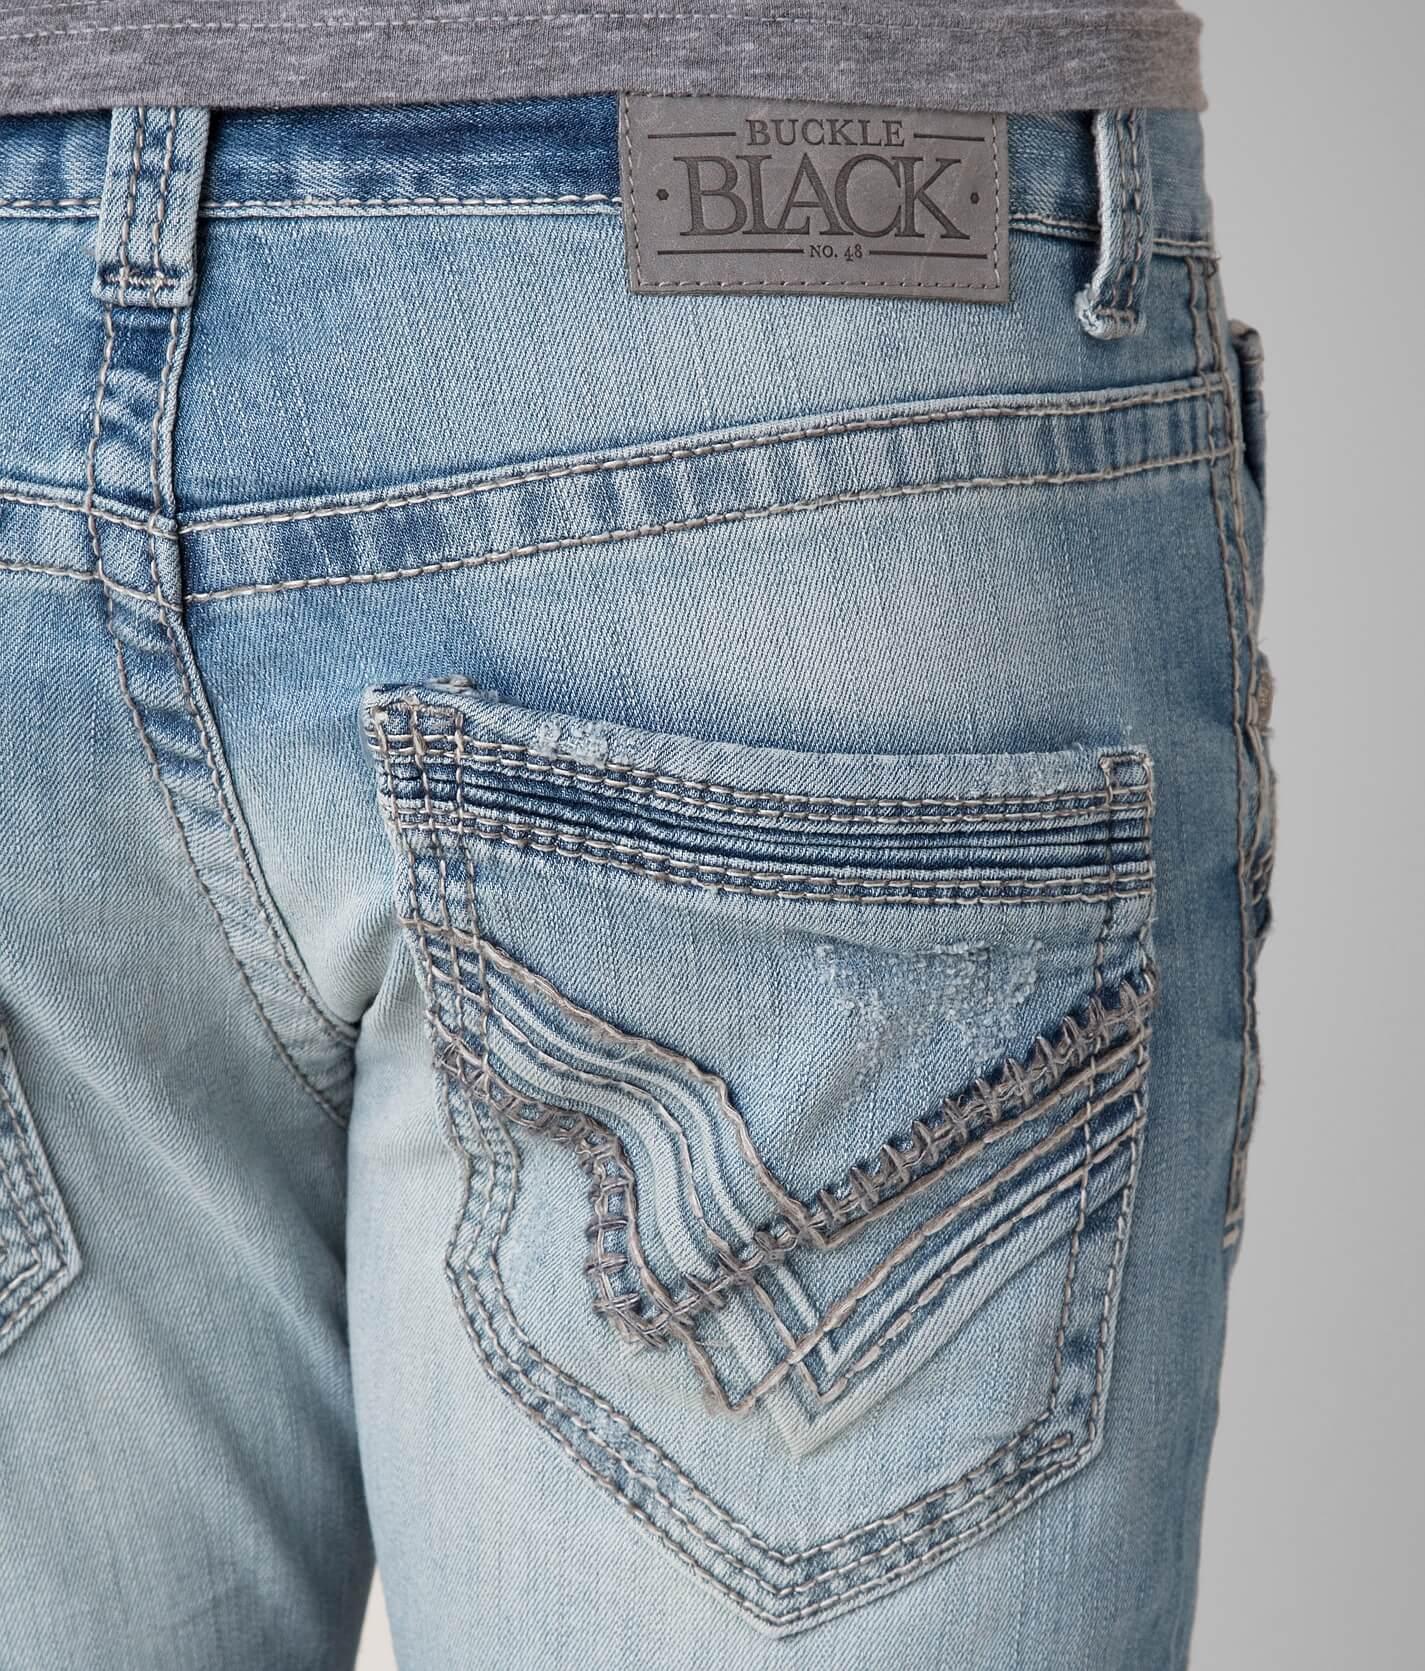 8dc7e8bb21d Buckle Black Three Straight Stretch Jean  6XuXh0108721  -  30.99